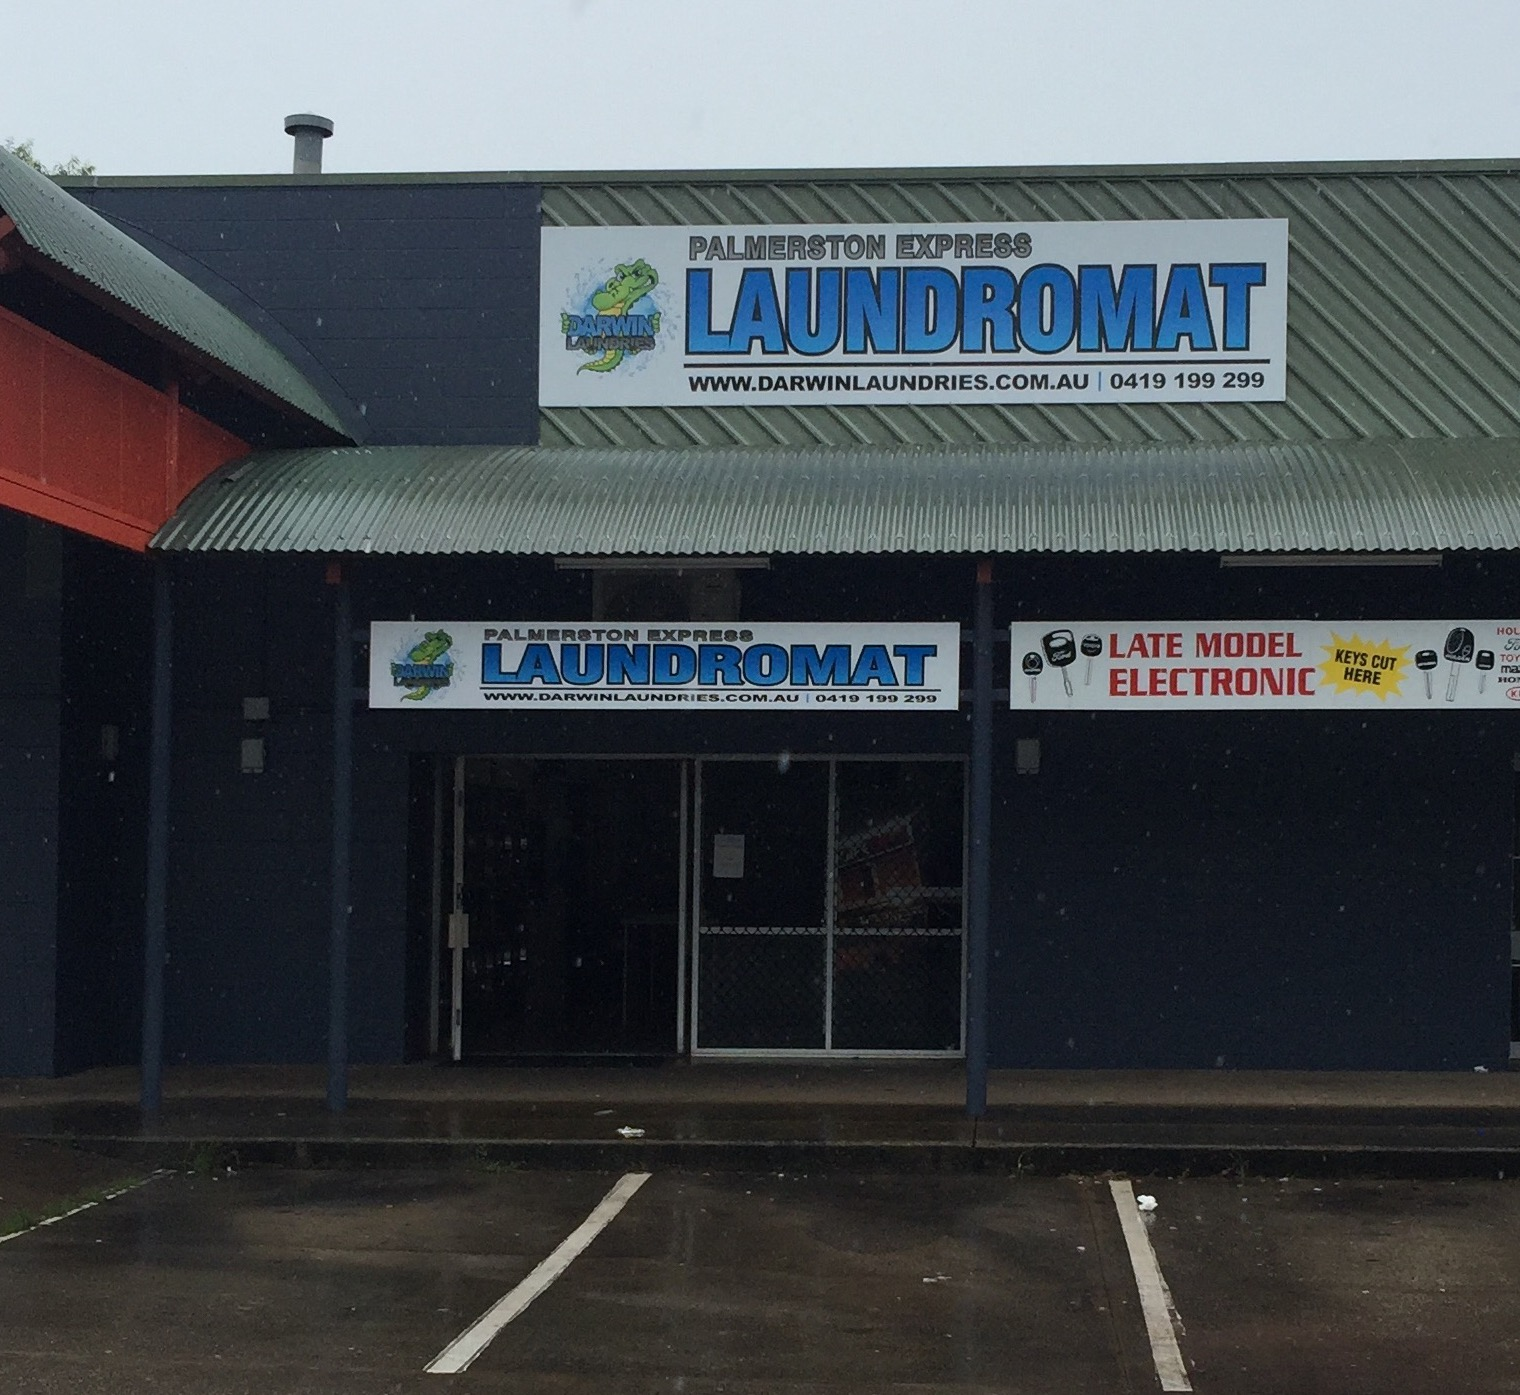 Palmerston Express Laundromat